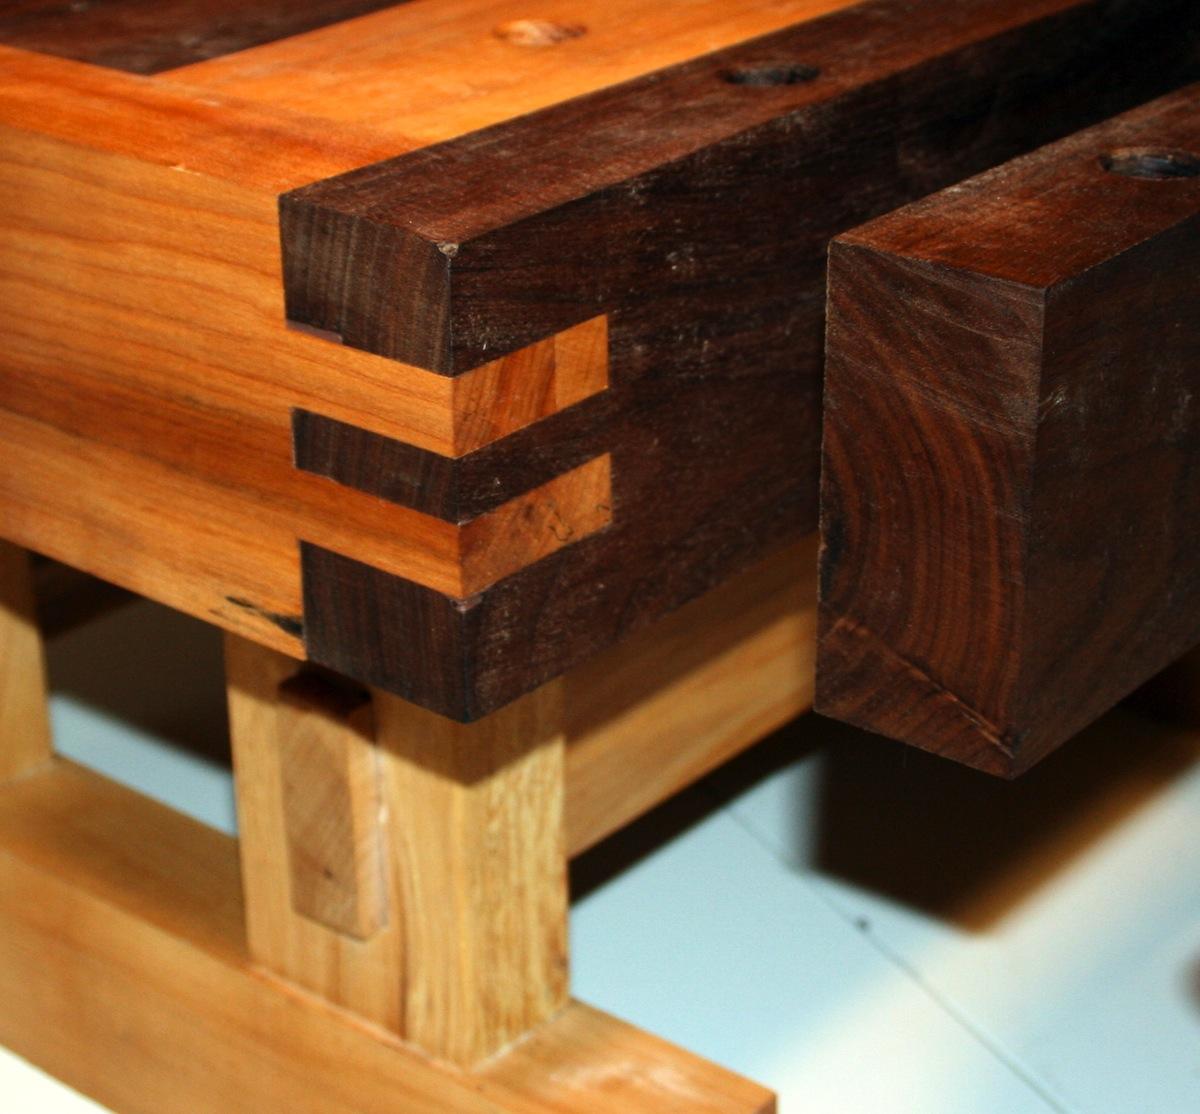 Sensational Jordans Benchtop Workbench The Wood Whisperer Frankydiablos Diy Chair Ideas Frankydiabloscom